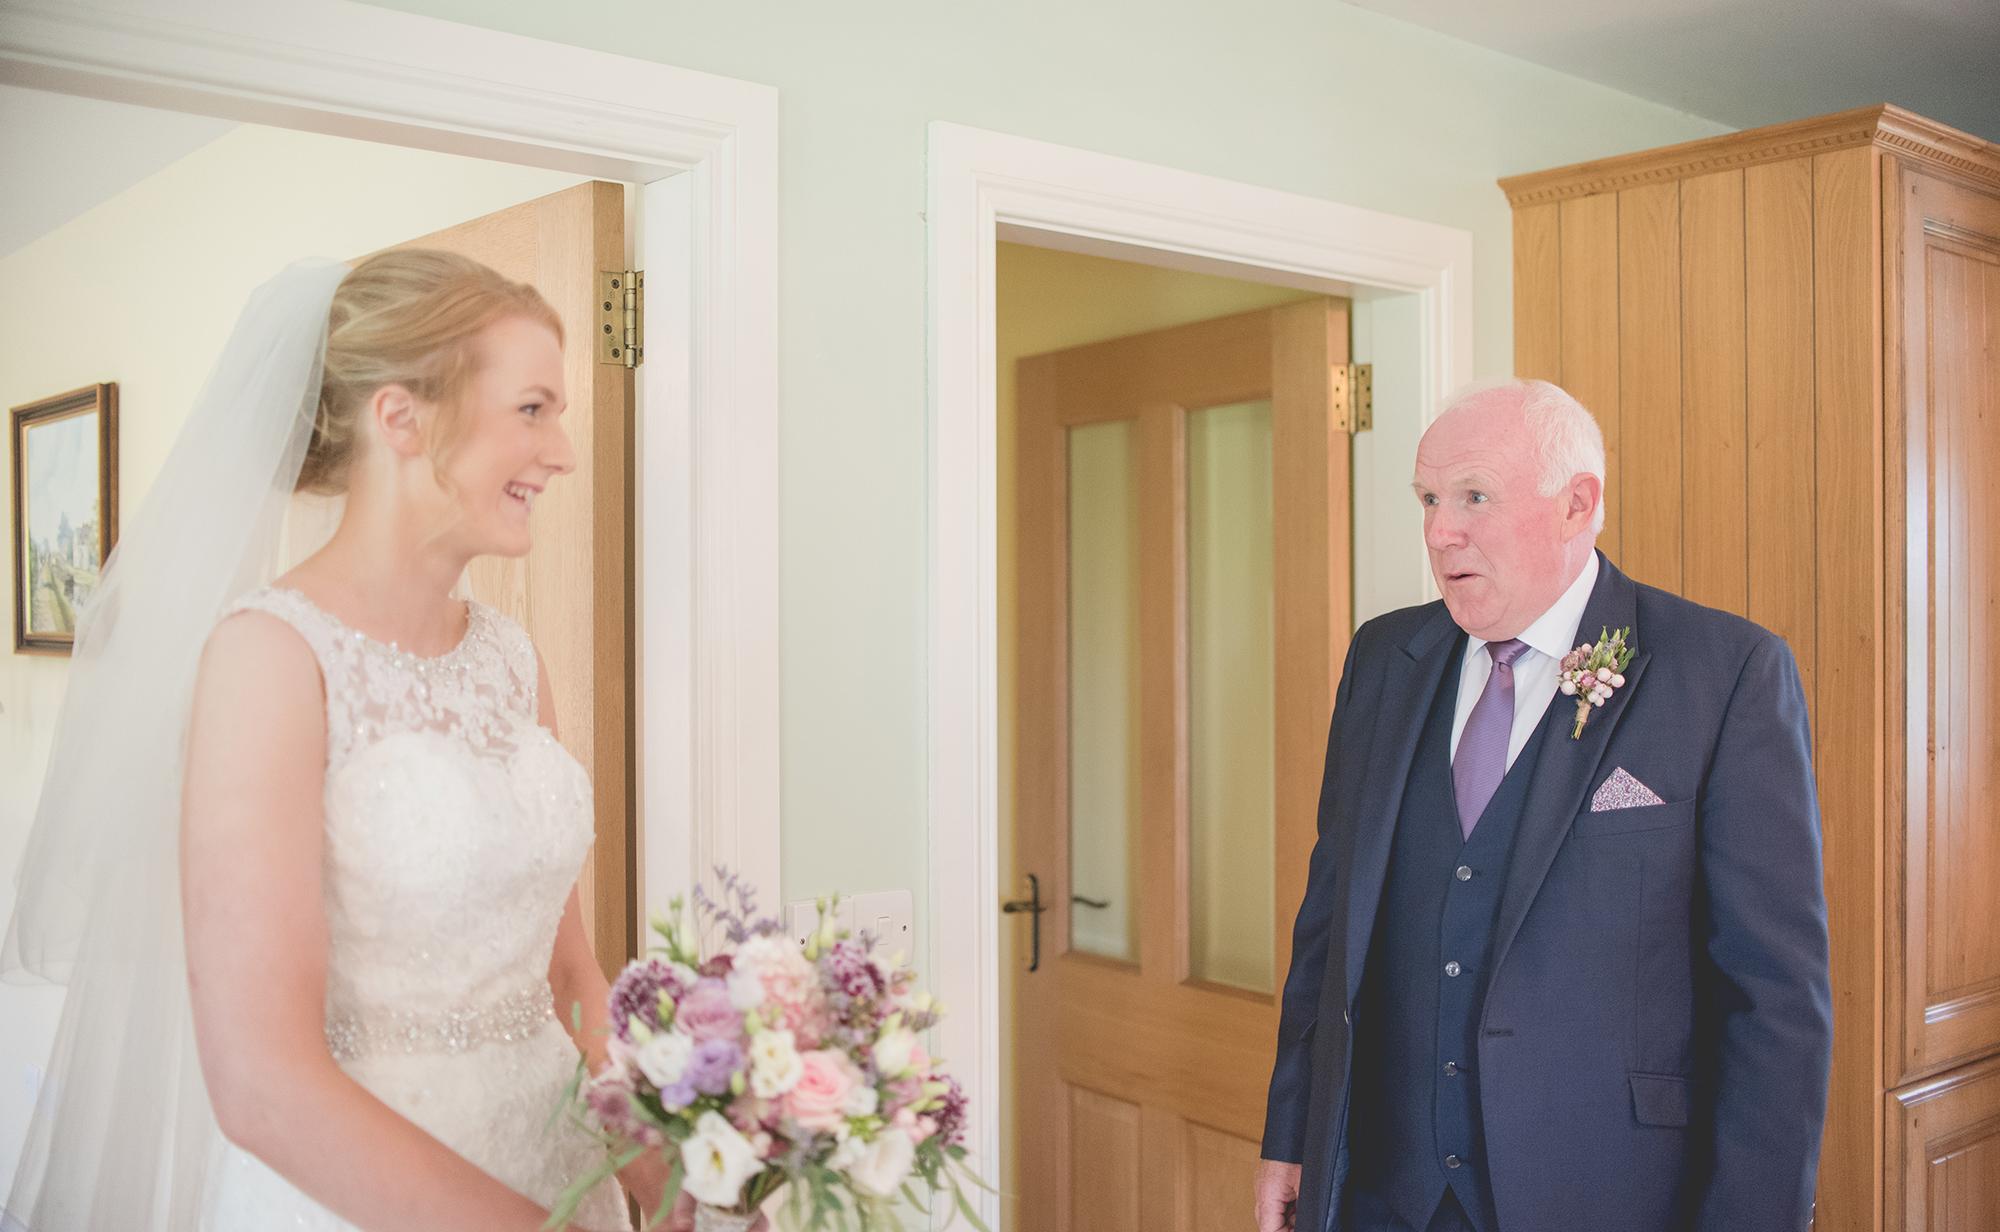 ballygally wedding photography tc photography larne belfast lisburn 28